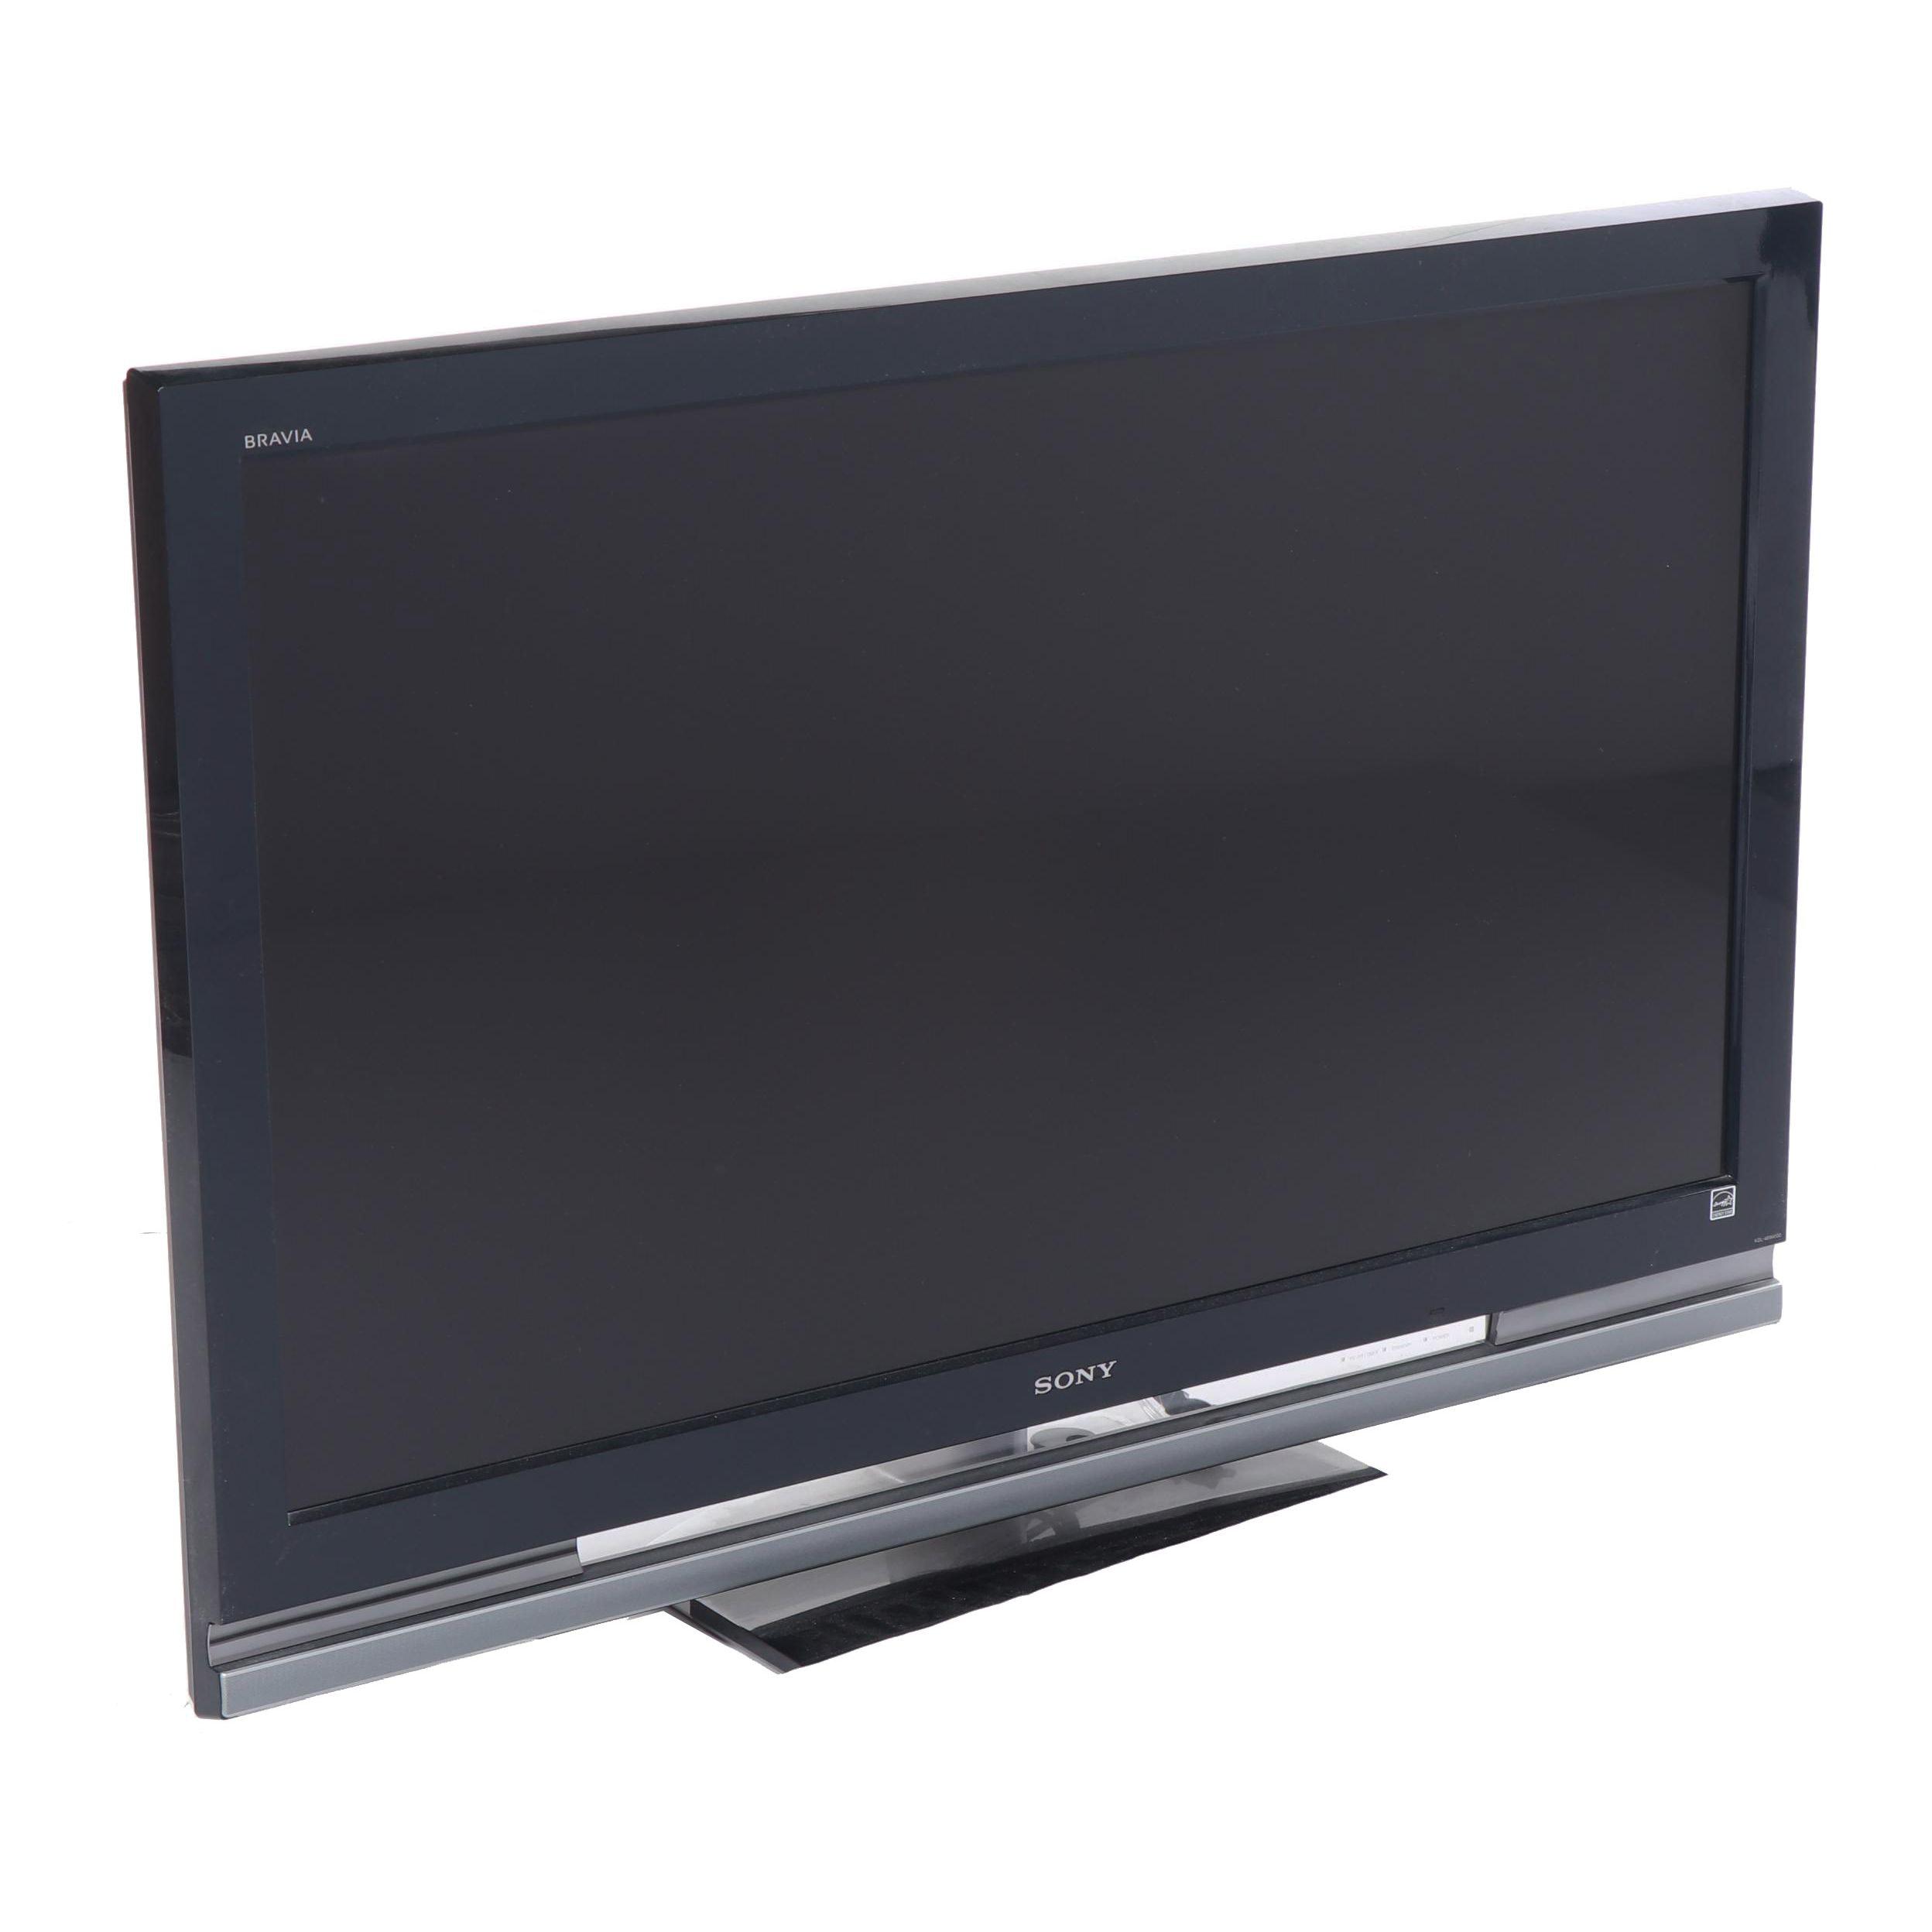 Sony Bravia KDL-46W4100 LCD Television